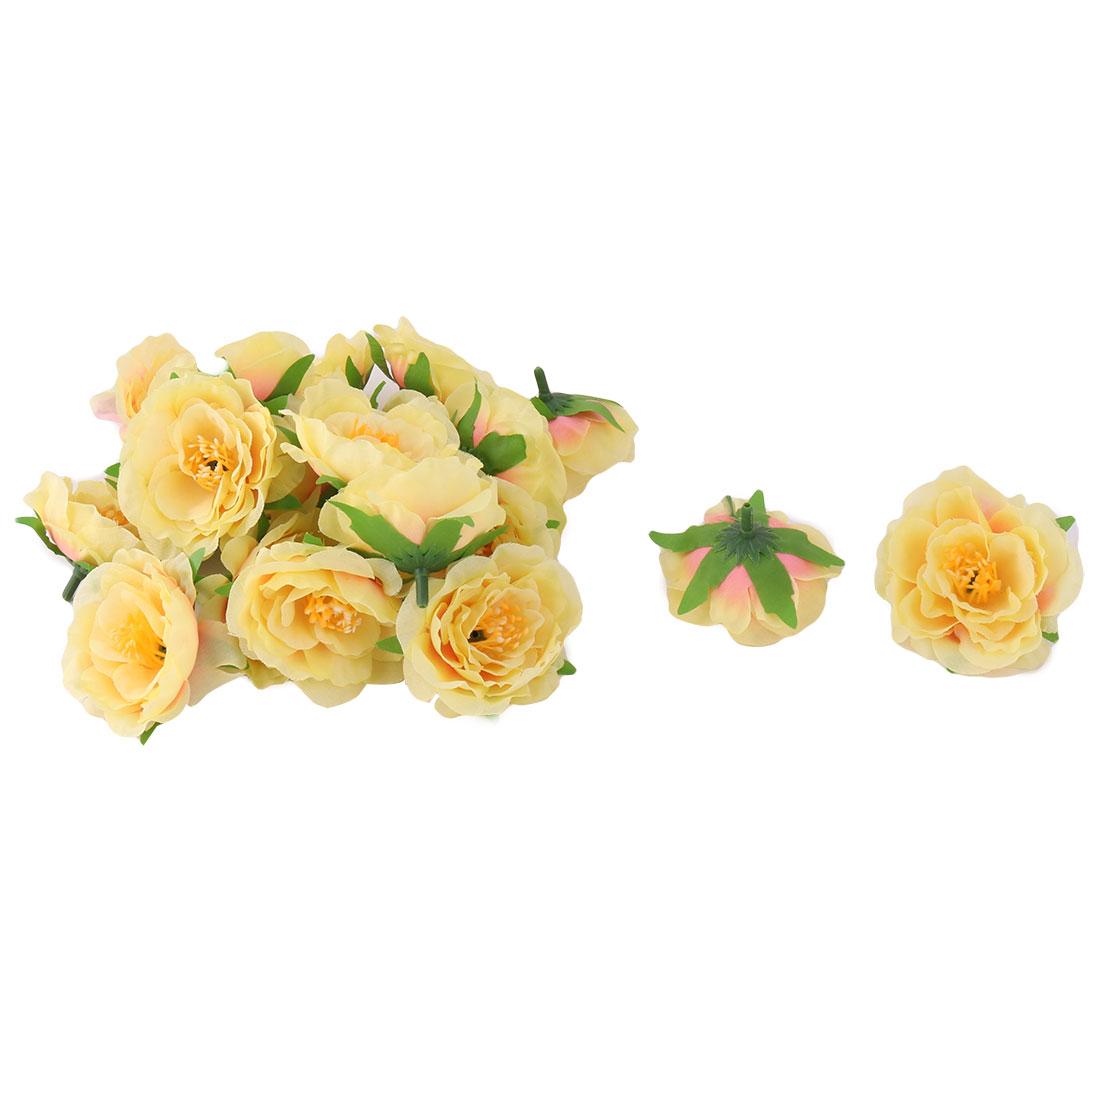 Wedding Fabric Handcraft Table Desk Decor Artificial Flower Heads Yellow 20pcs